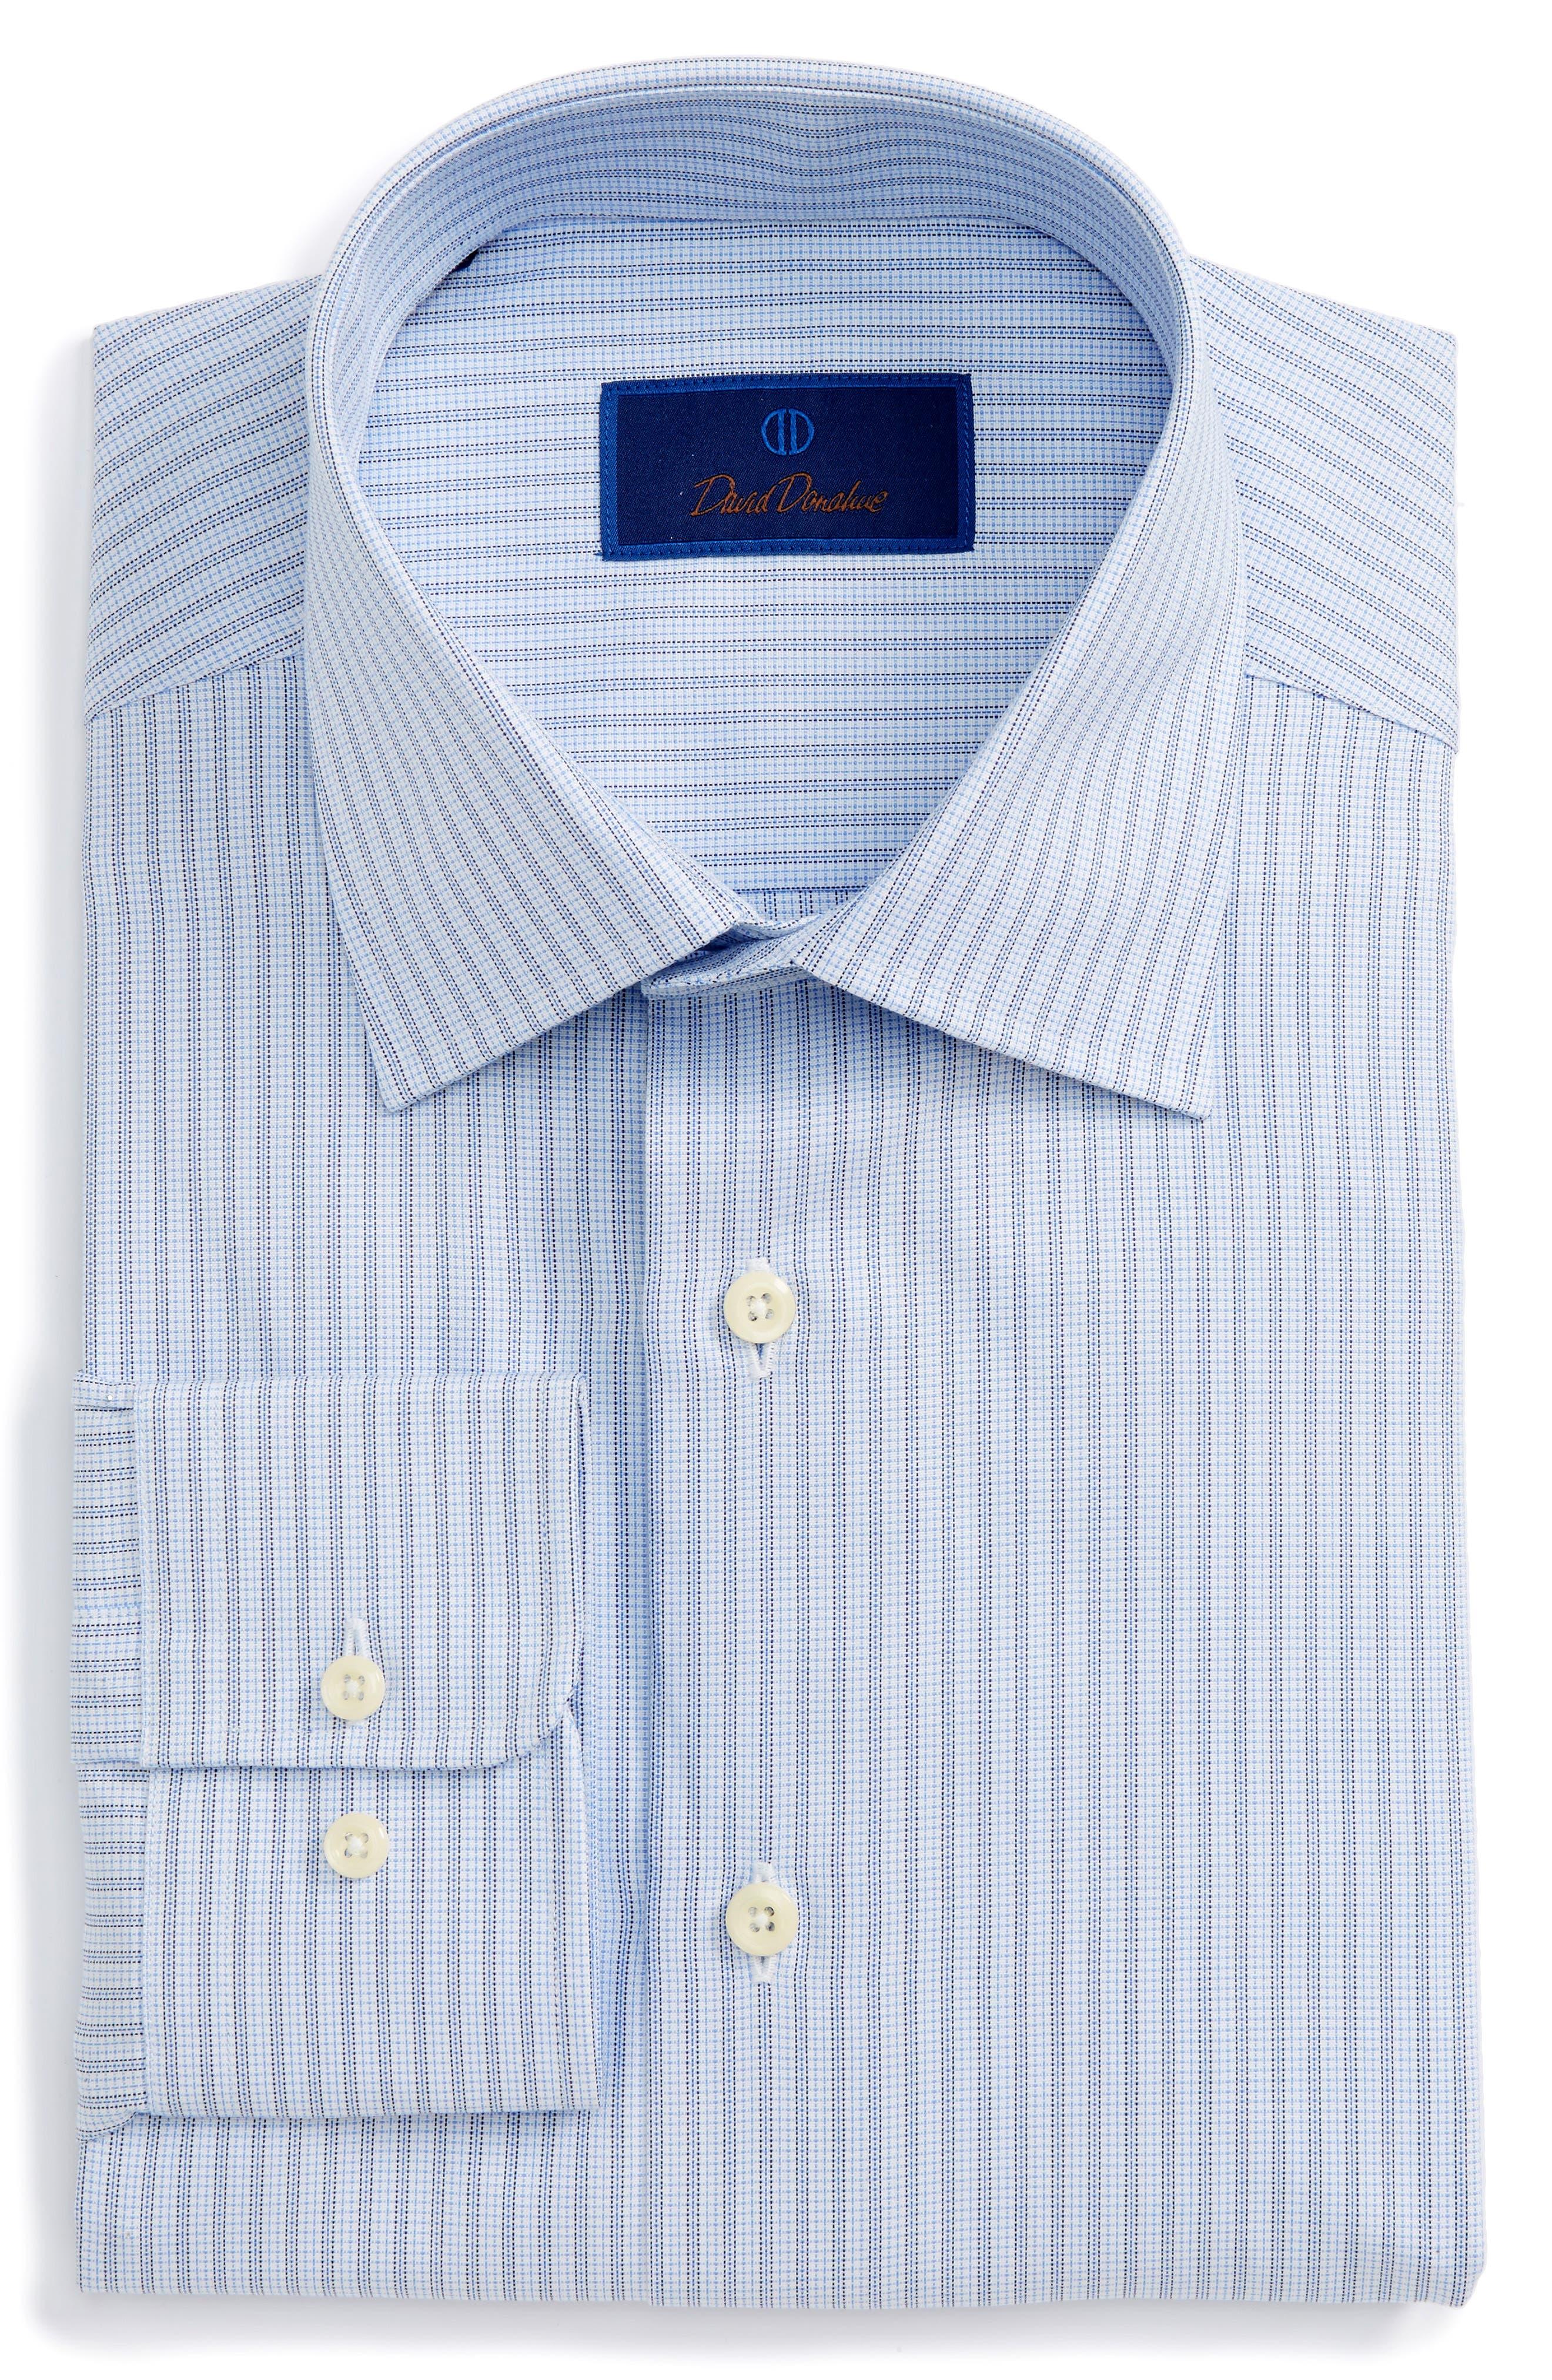 Regular Fit Stripe Dress Shirt,                         Main,                         color, Sky/ Navy